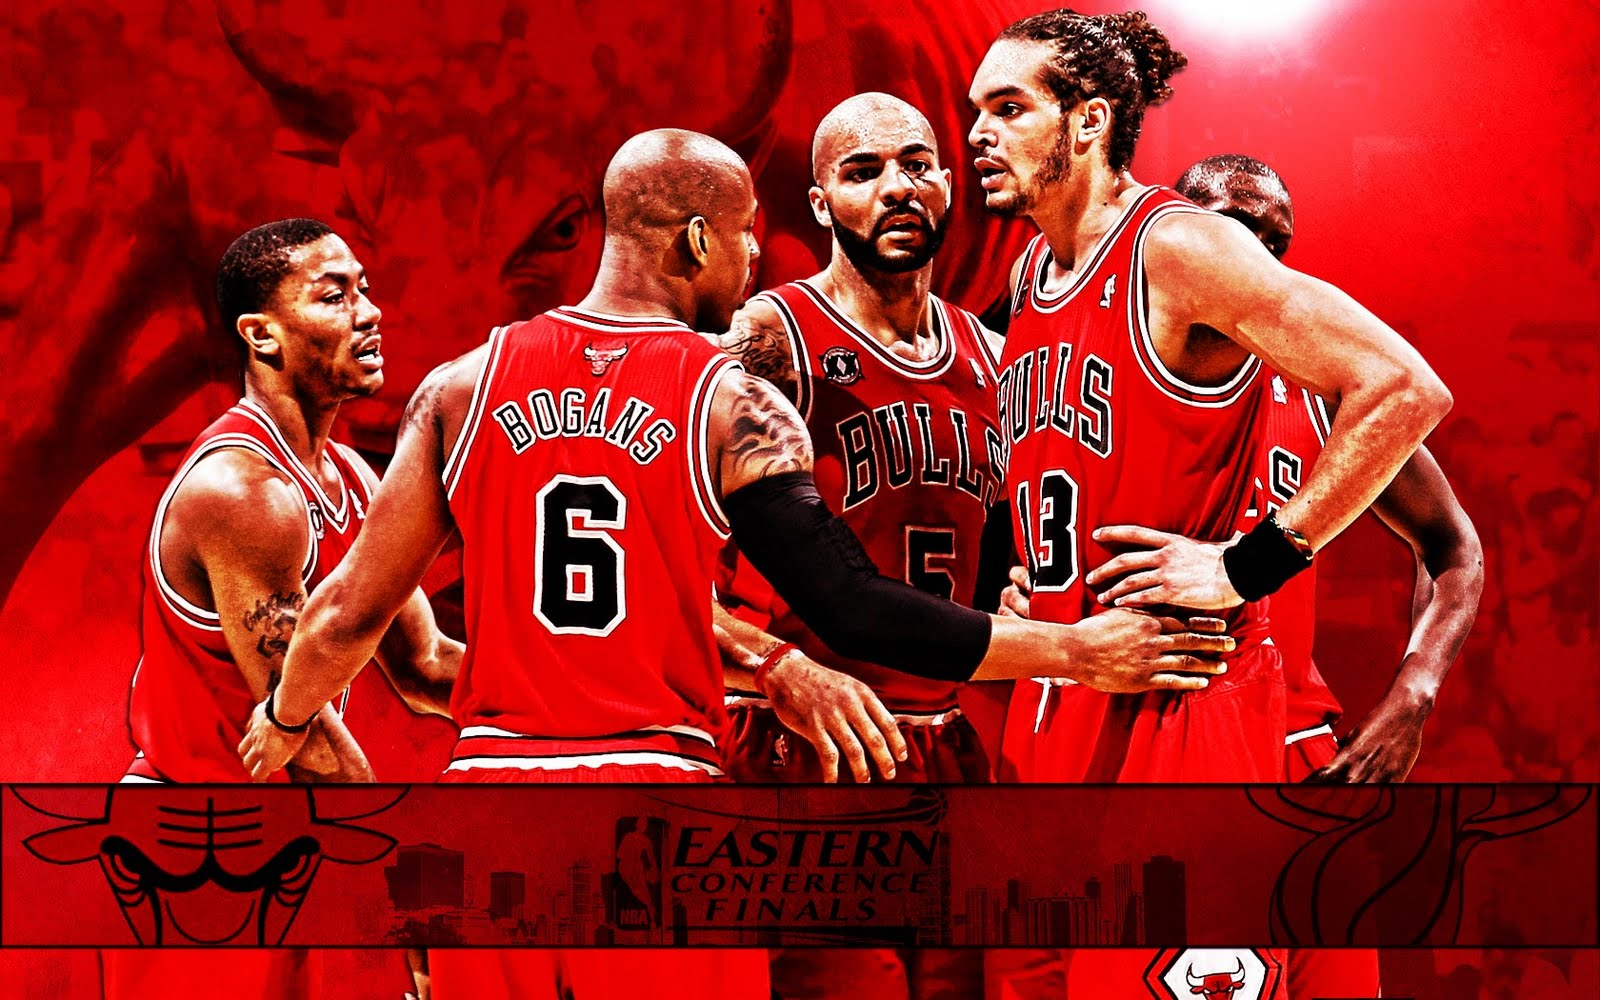 Chicago Bulls 2011 NBA Conference Finals Widescreen Wallpaper ~ Big Fan of NBA - Daily Update